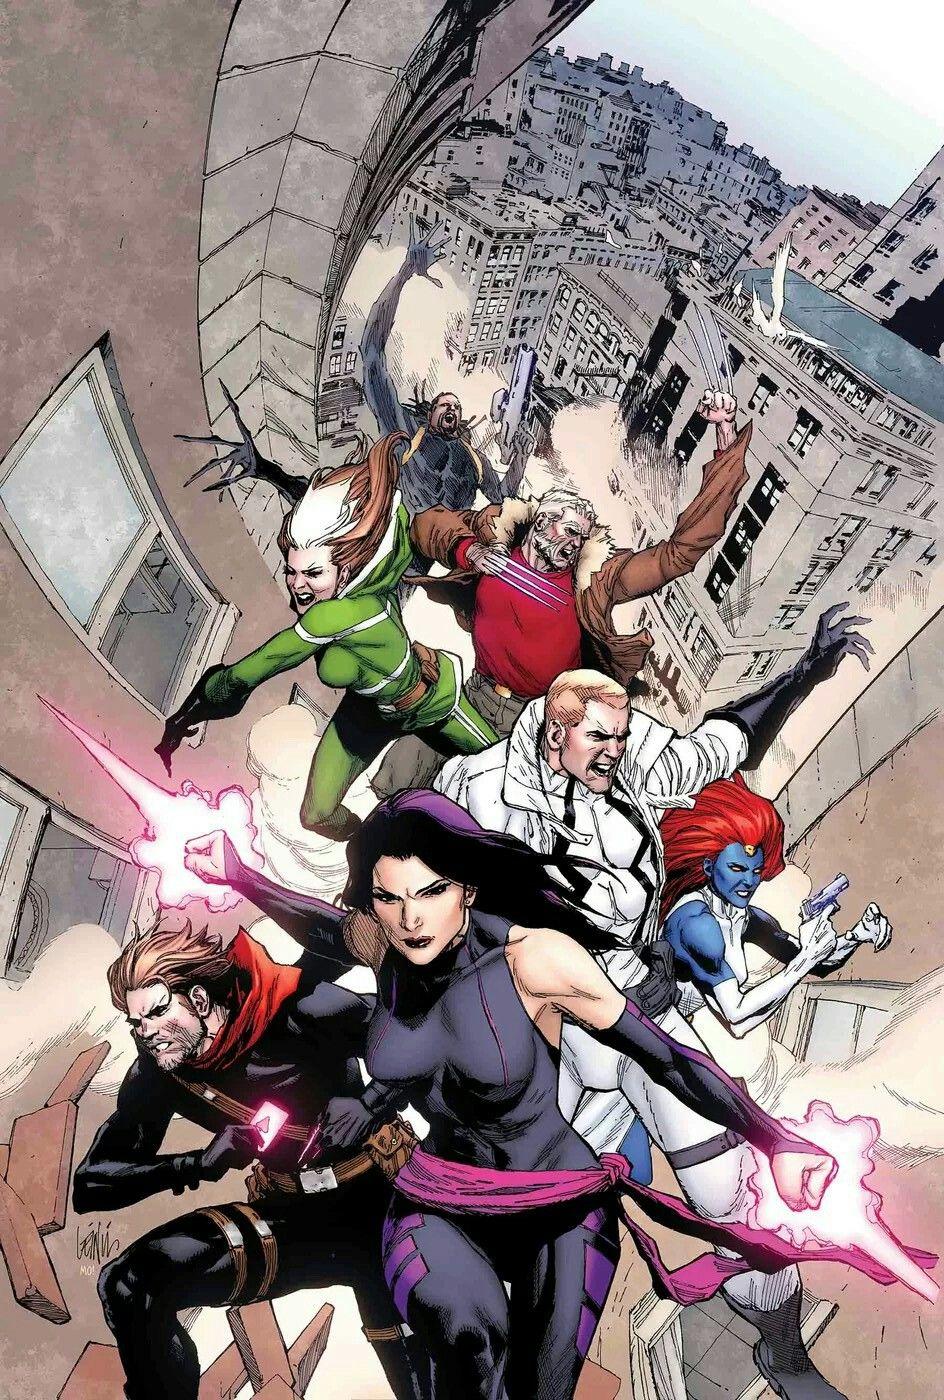 Astonishing X-Men #9 by - Psylocke, Gambit, Fantomex